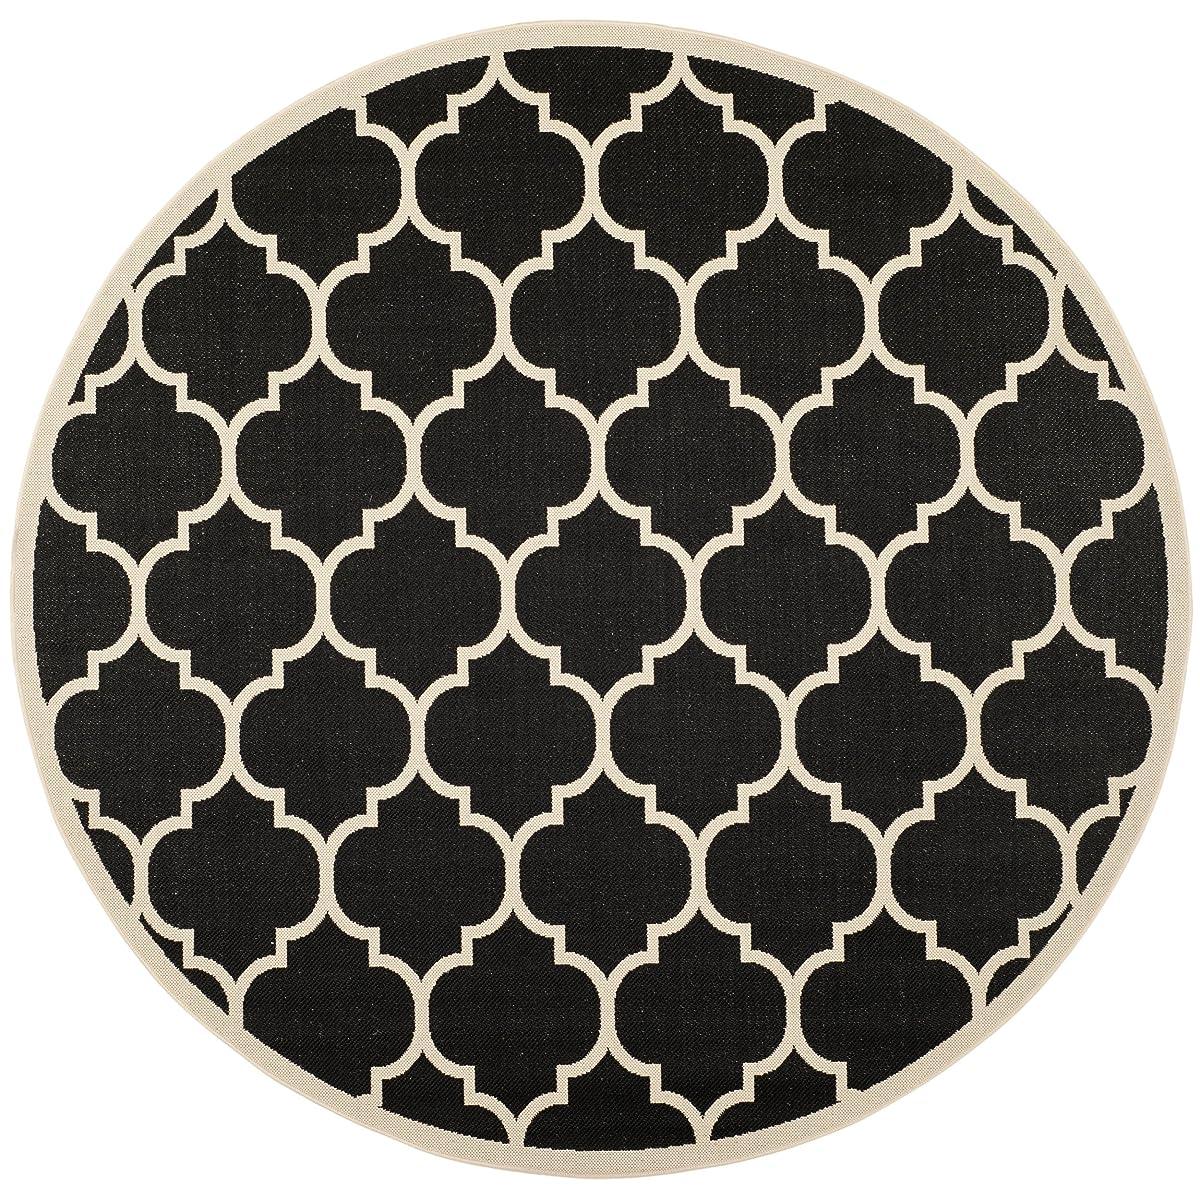 "Safavieh Courtyard Collection CY6914-266 Black and Beige Indoor/ Outdoor Round Area Rug (53"" Diameter)"